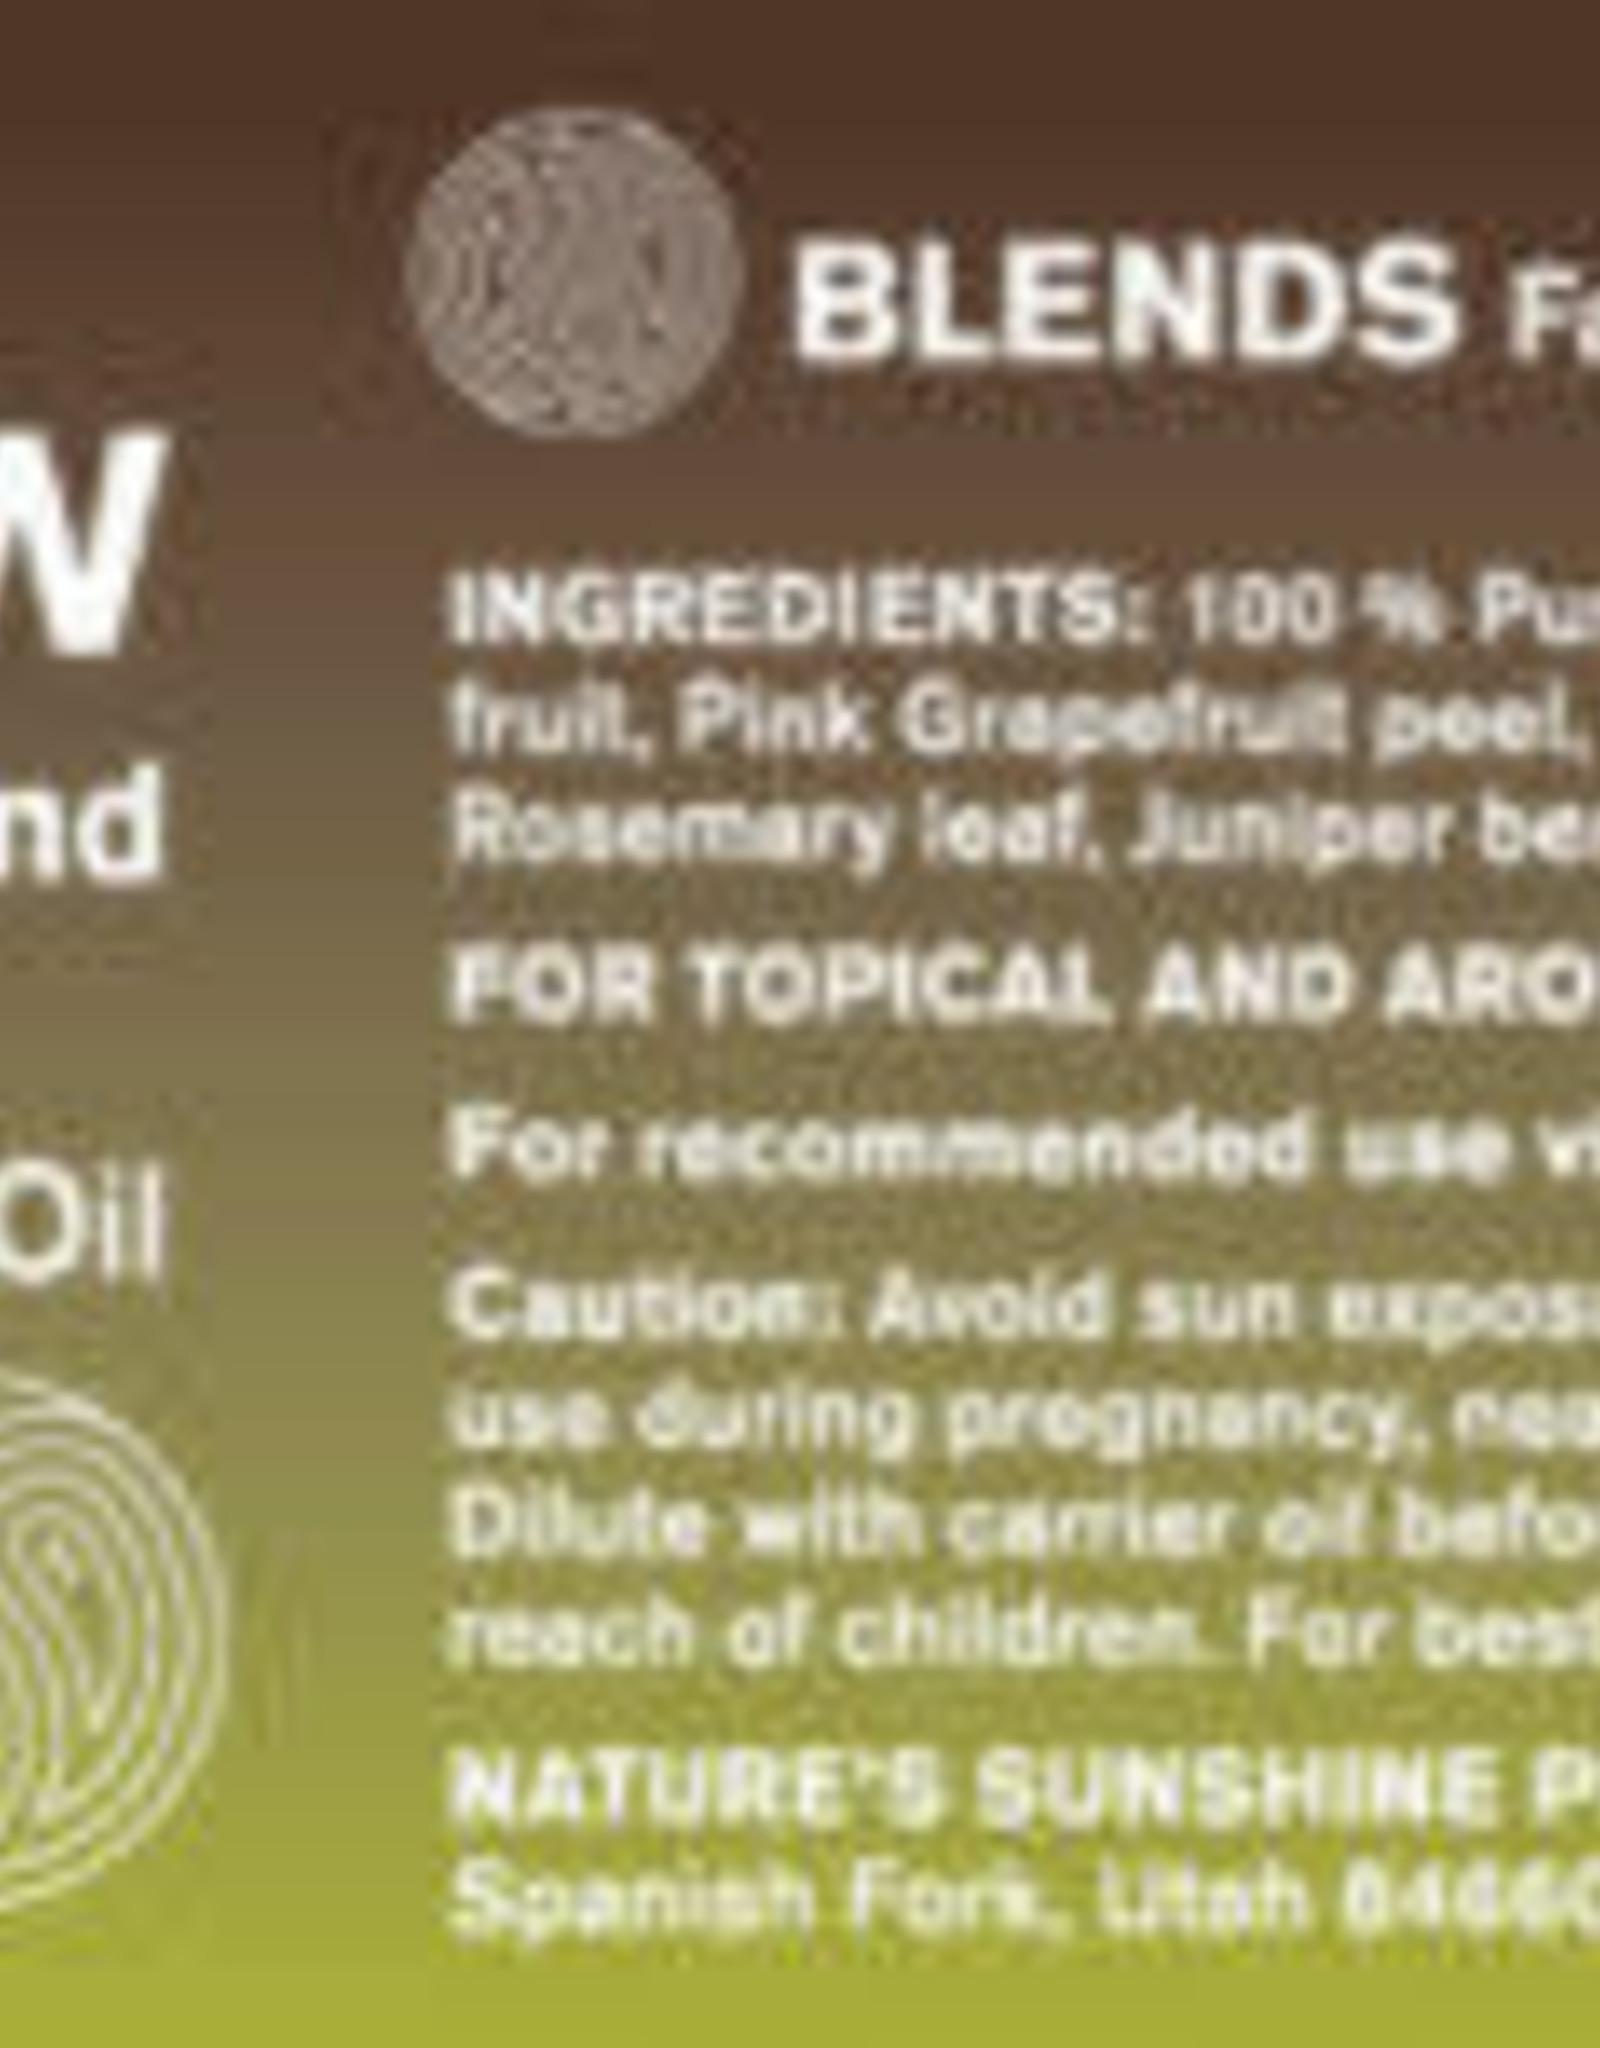 Nature's Sunshine Renew Oil Blend